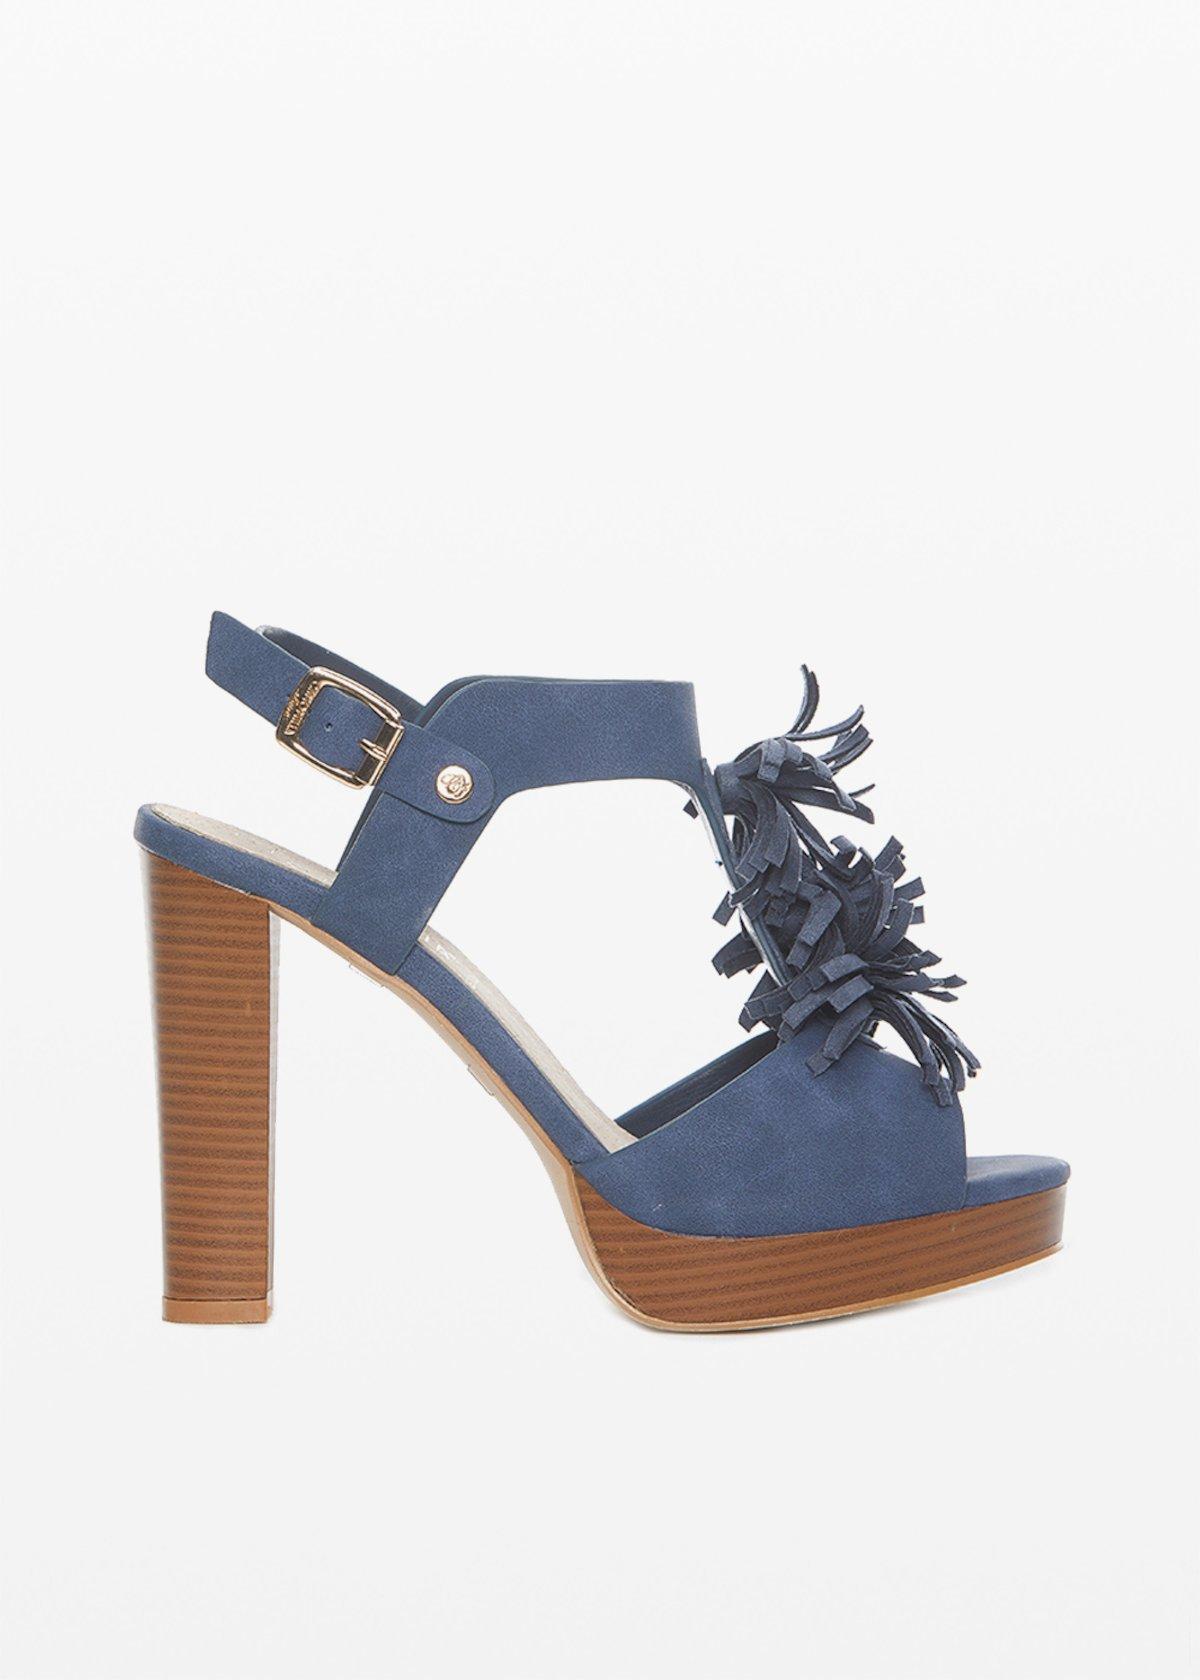 Samoah sandal with tassel and high heel - Medium Blue - Woman - Category image